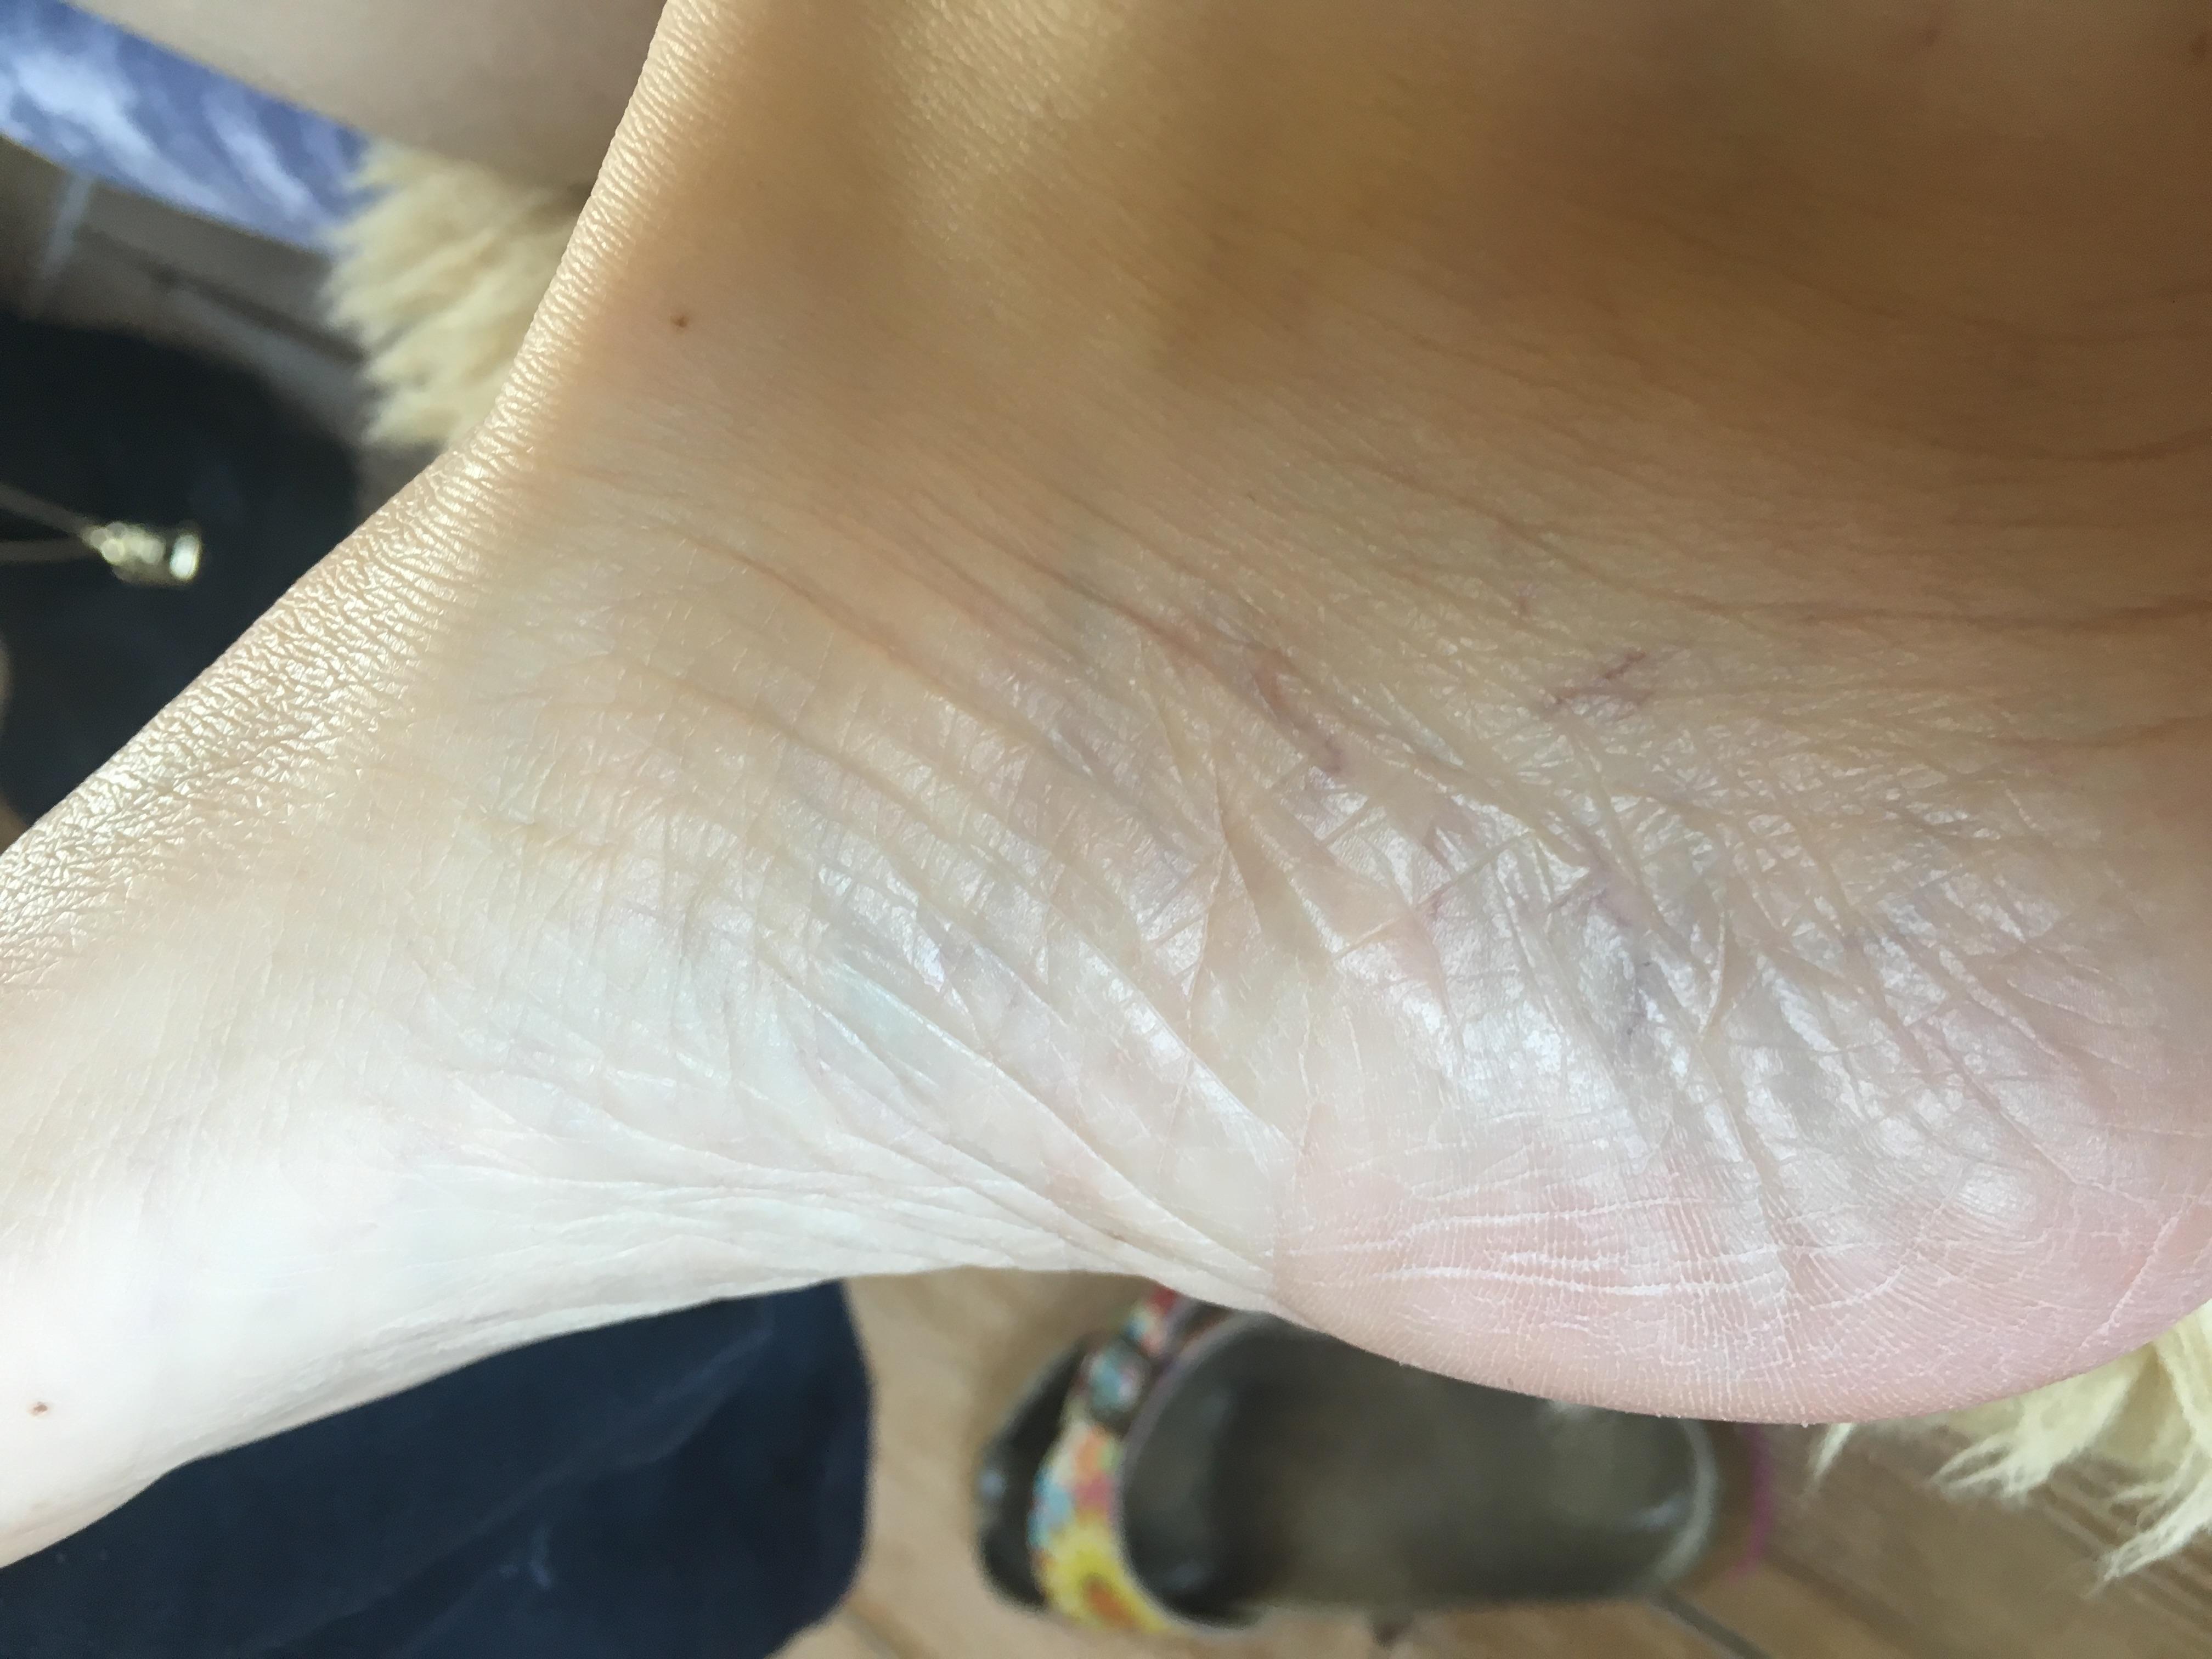 Nog frisse huid bij Monique 2 dg na peeling